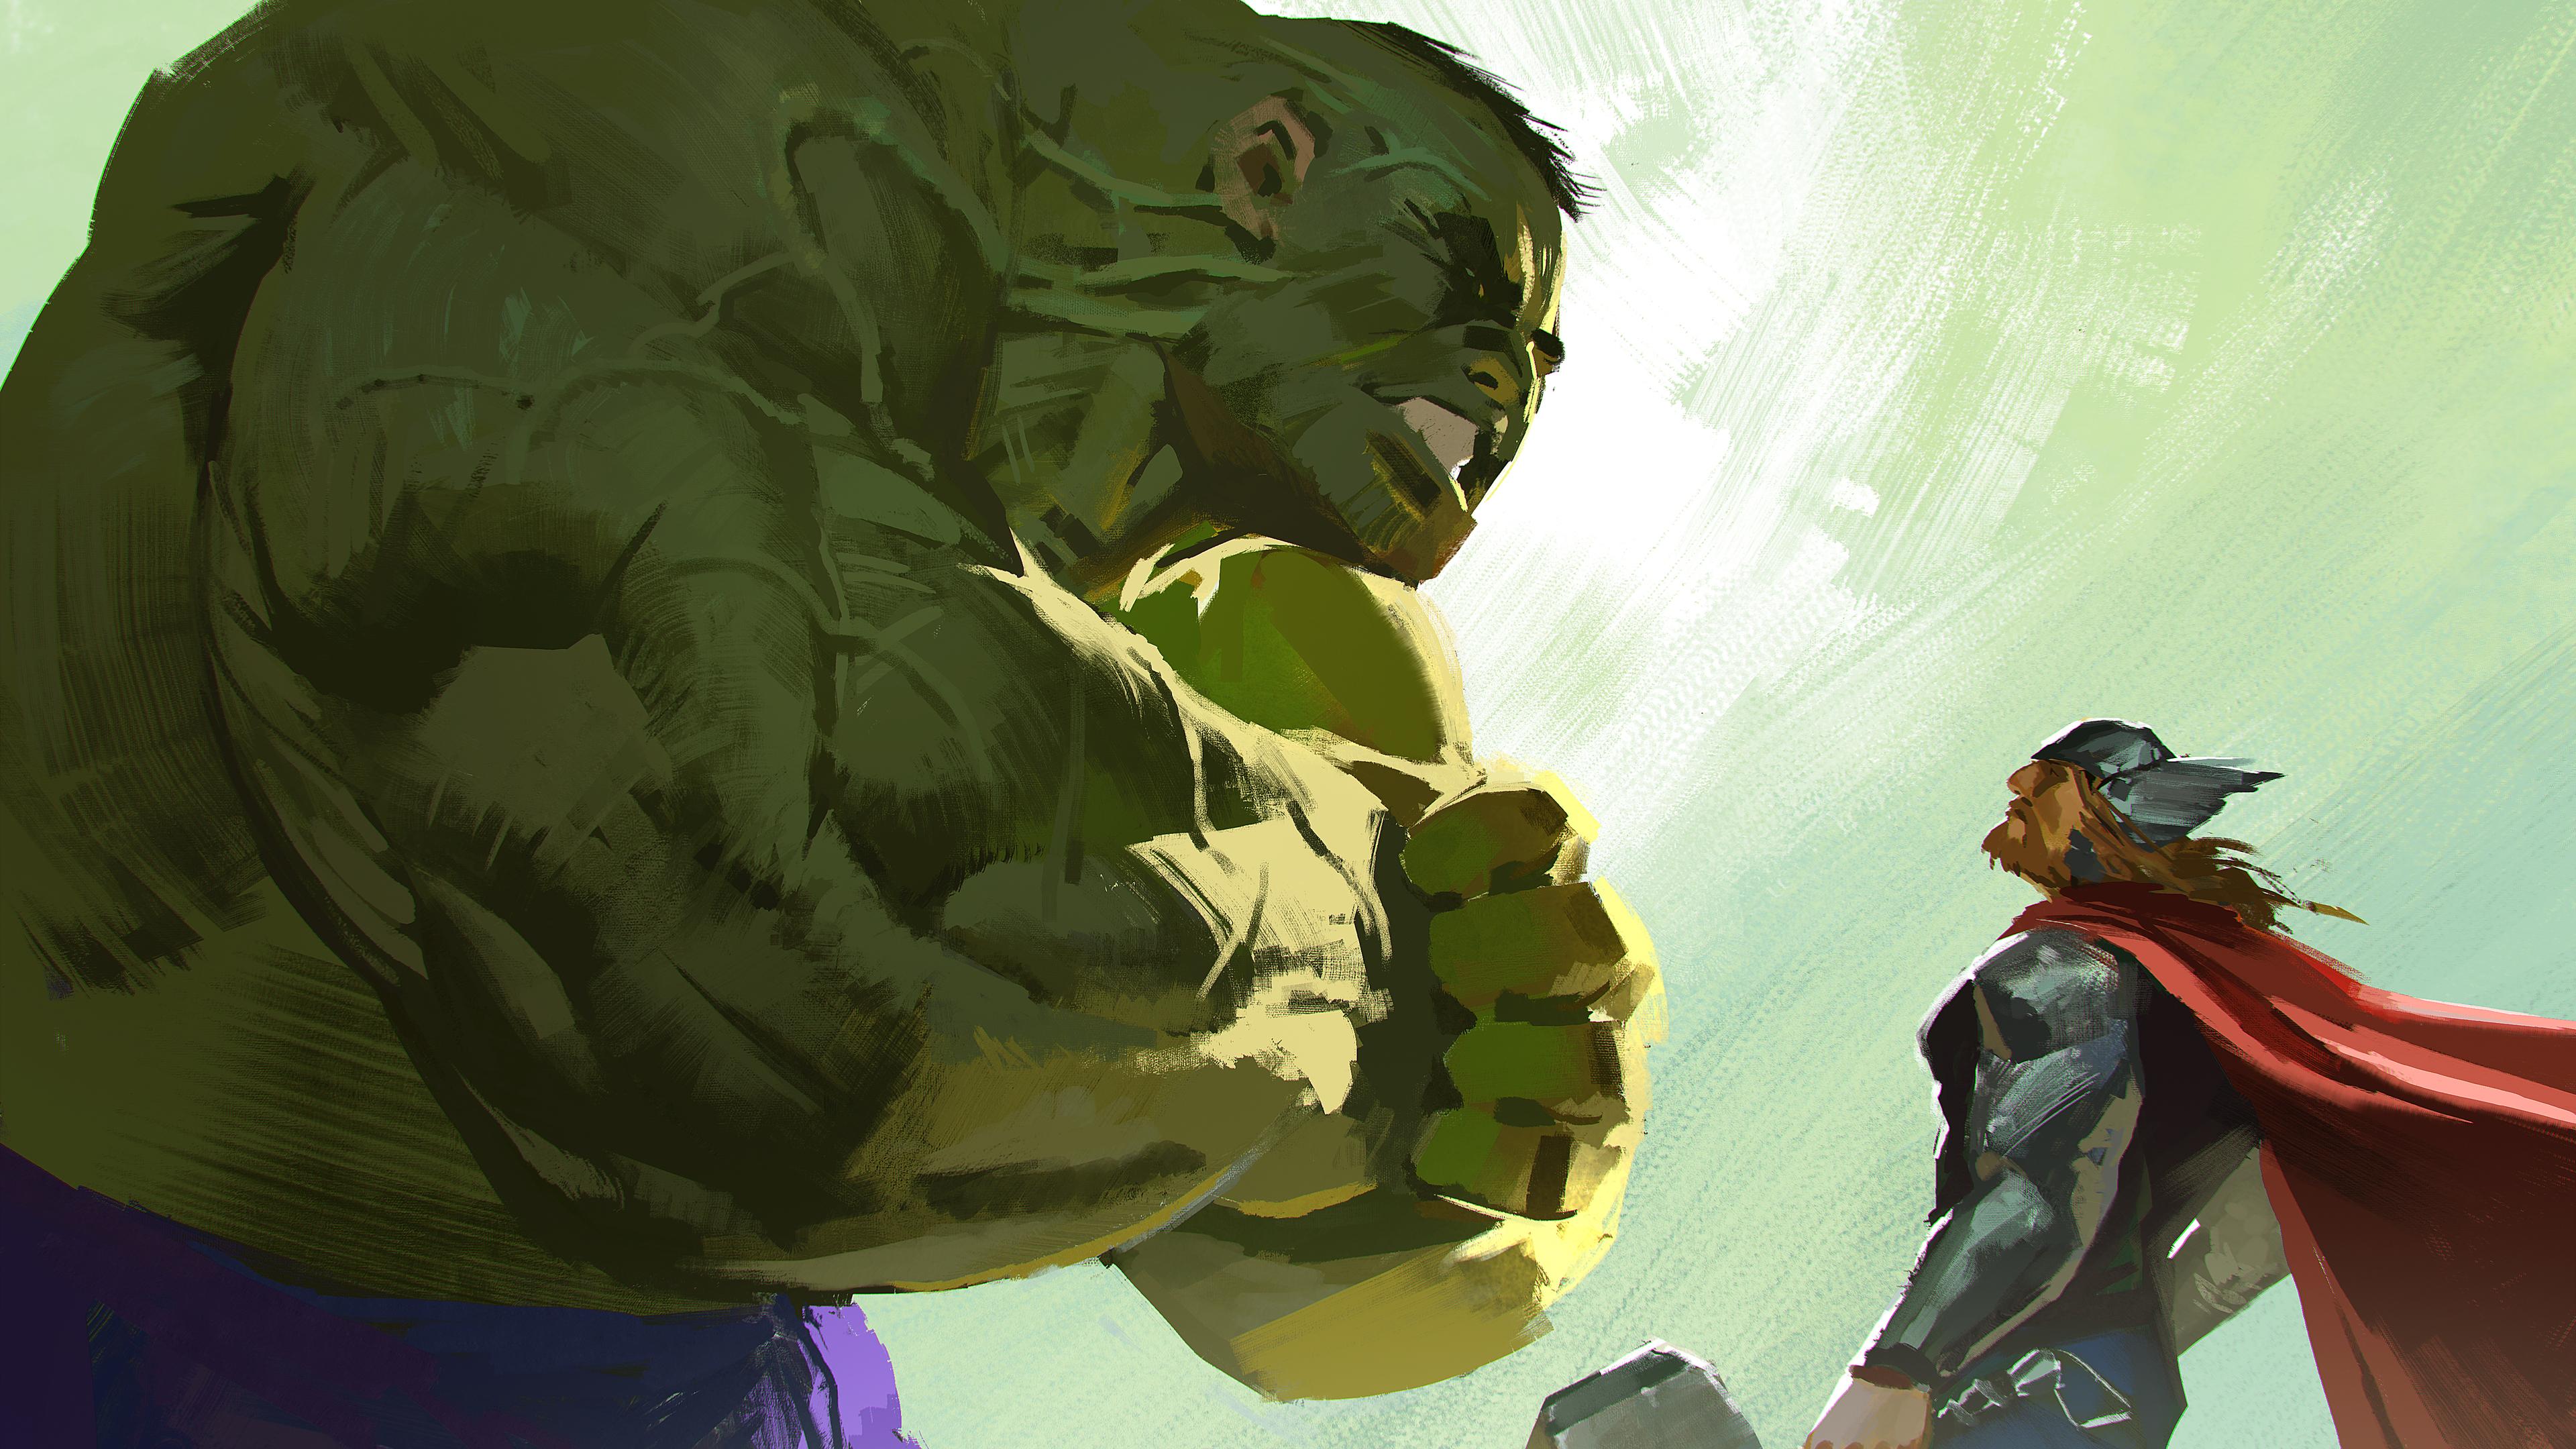 thor vs hulk 5k artwork 1538786493 - Thor Vs Hulk 5k Artwork - thor wallpapers, superheroes wallpapers, hulk wallpapers, hd-wallpapers, digital art wallpapers, deviantart wallpapers, artwork wallpapers, artist wallpapers, 5k wallpapers, 4k-wallpapers